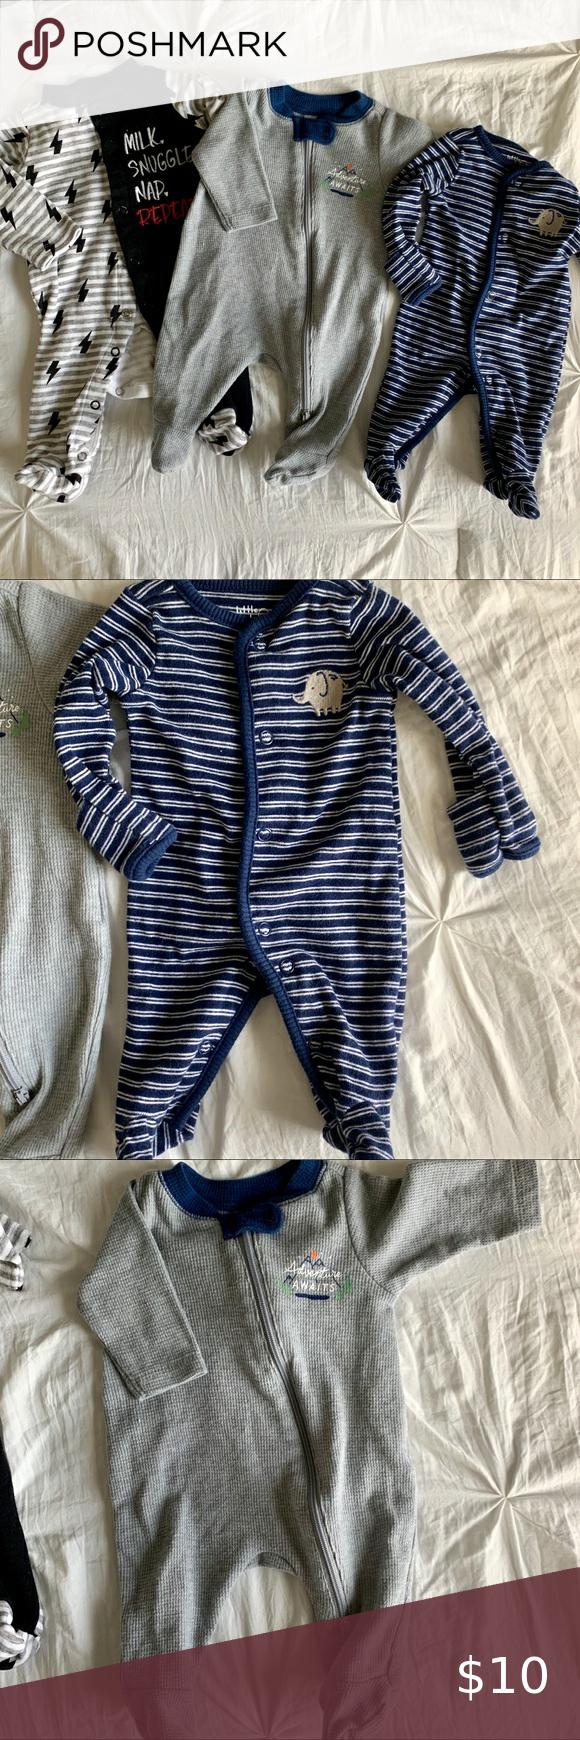 3 small newborn sleeper pajamas. in 2020 | Newborn sleeper ...